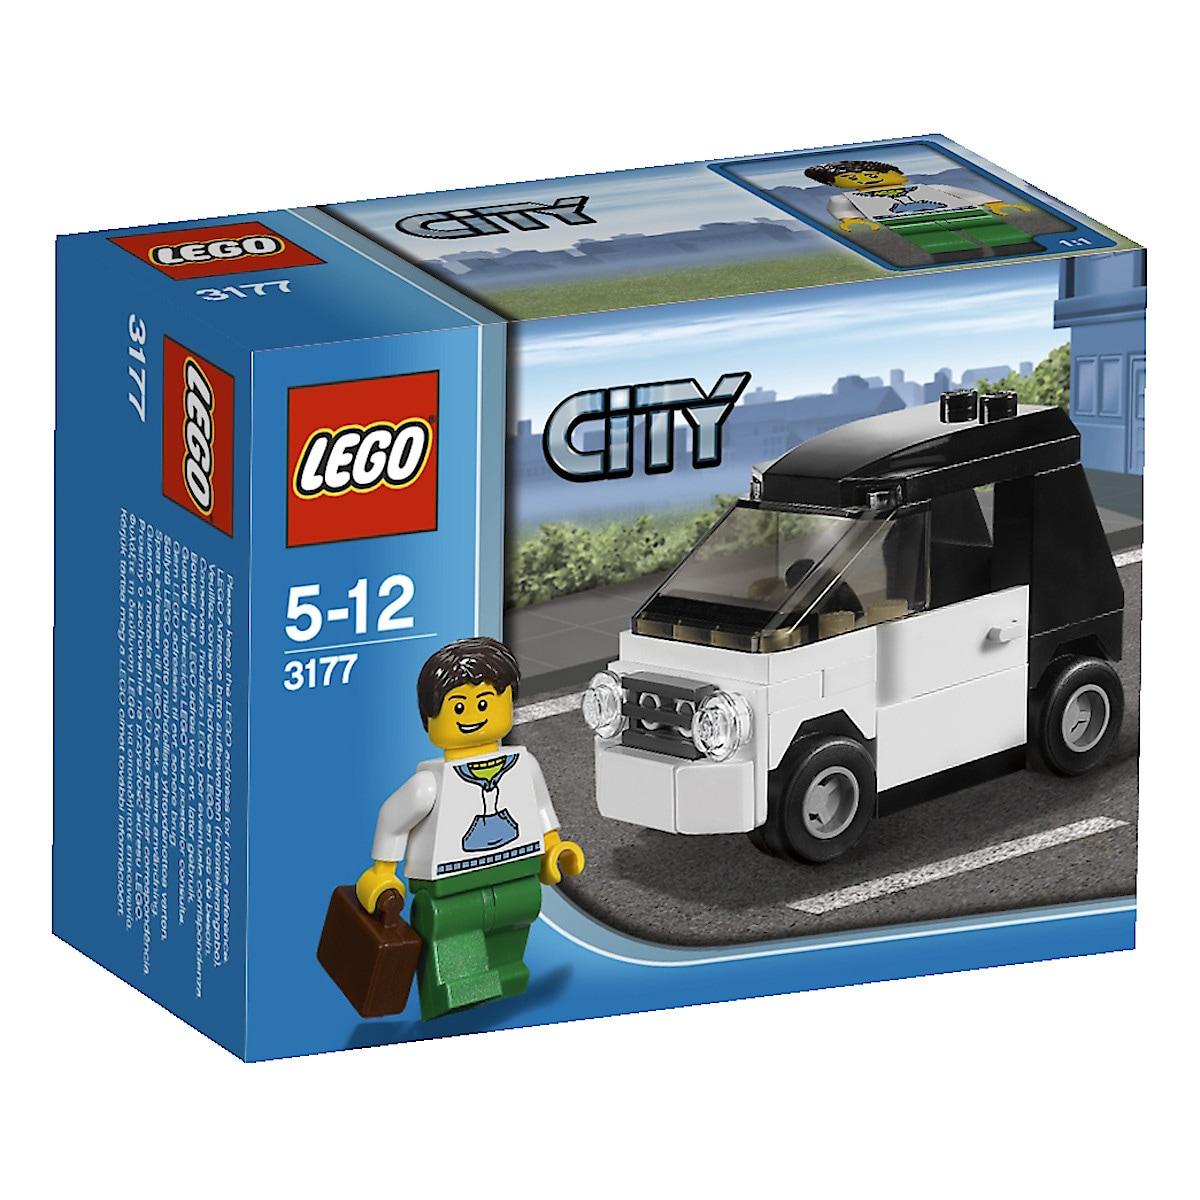 Minibil Lego City